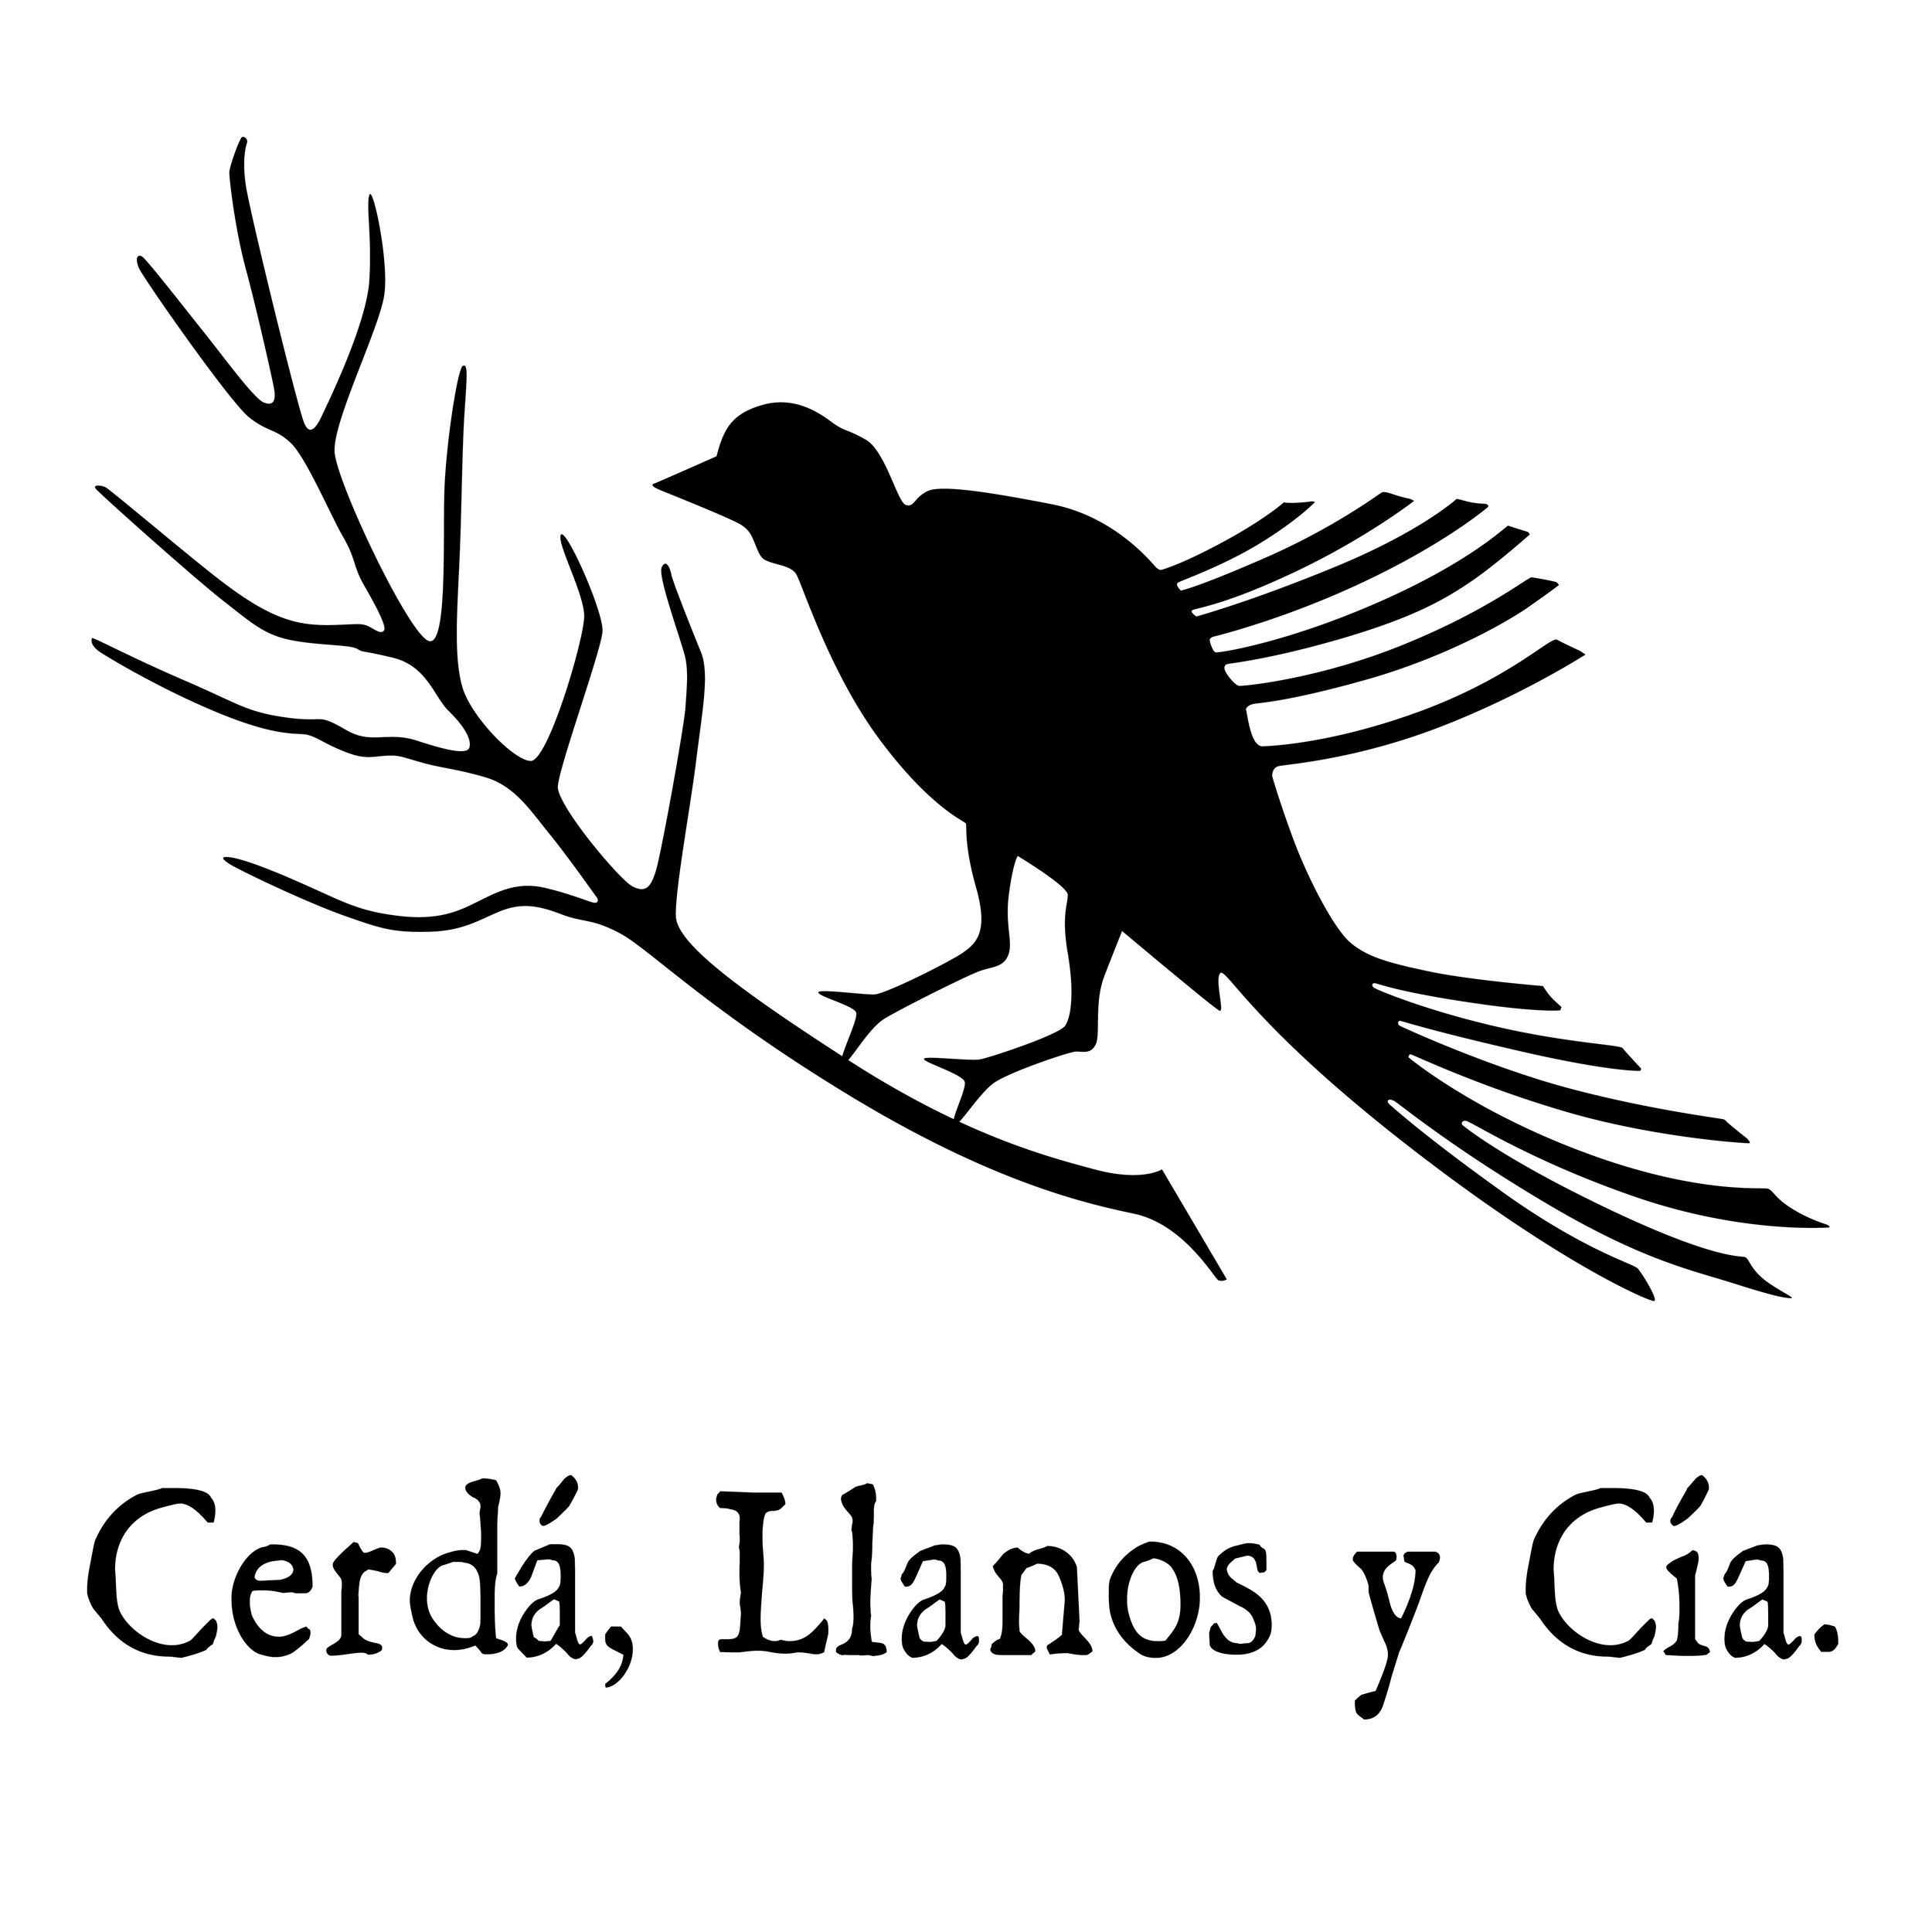 CLC_bird-branch-logo_bw_large.jpg